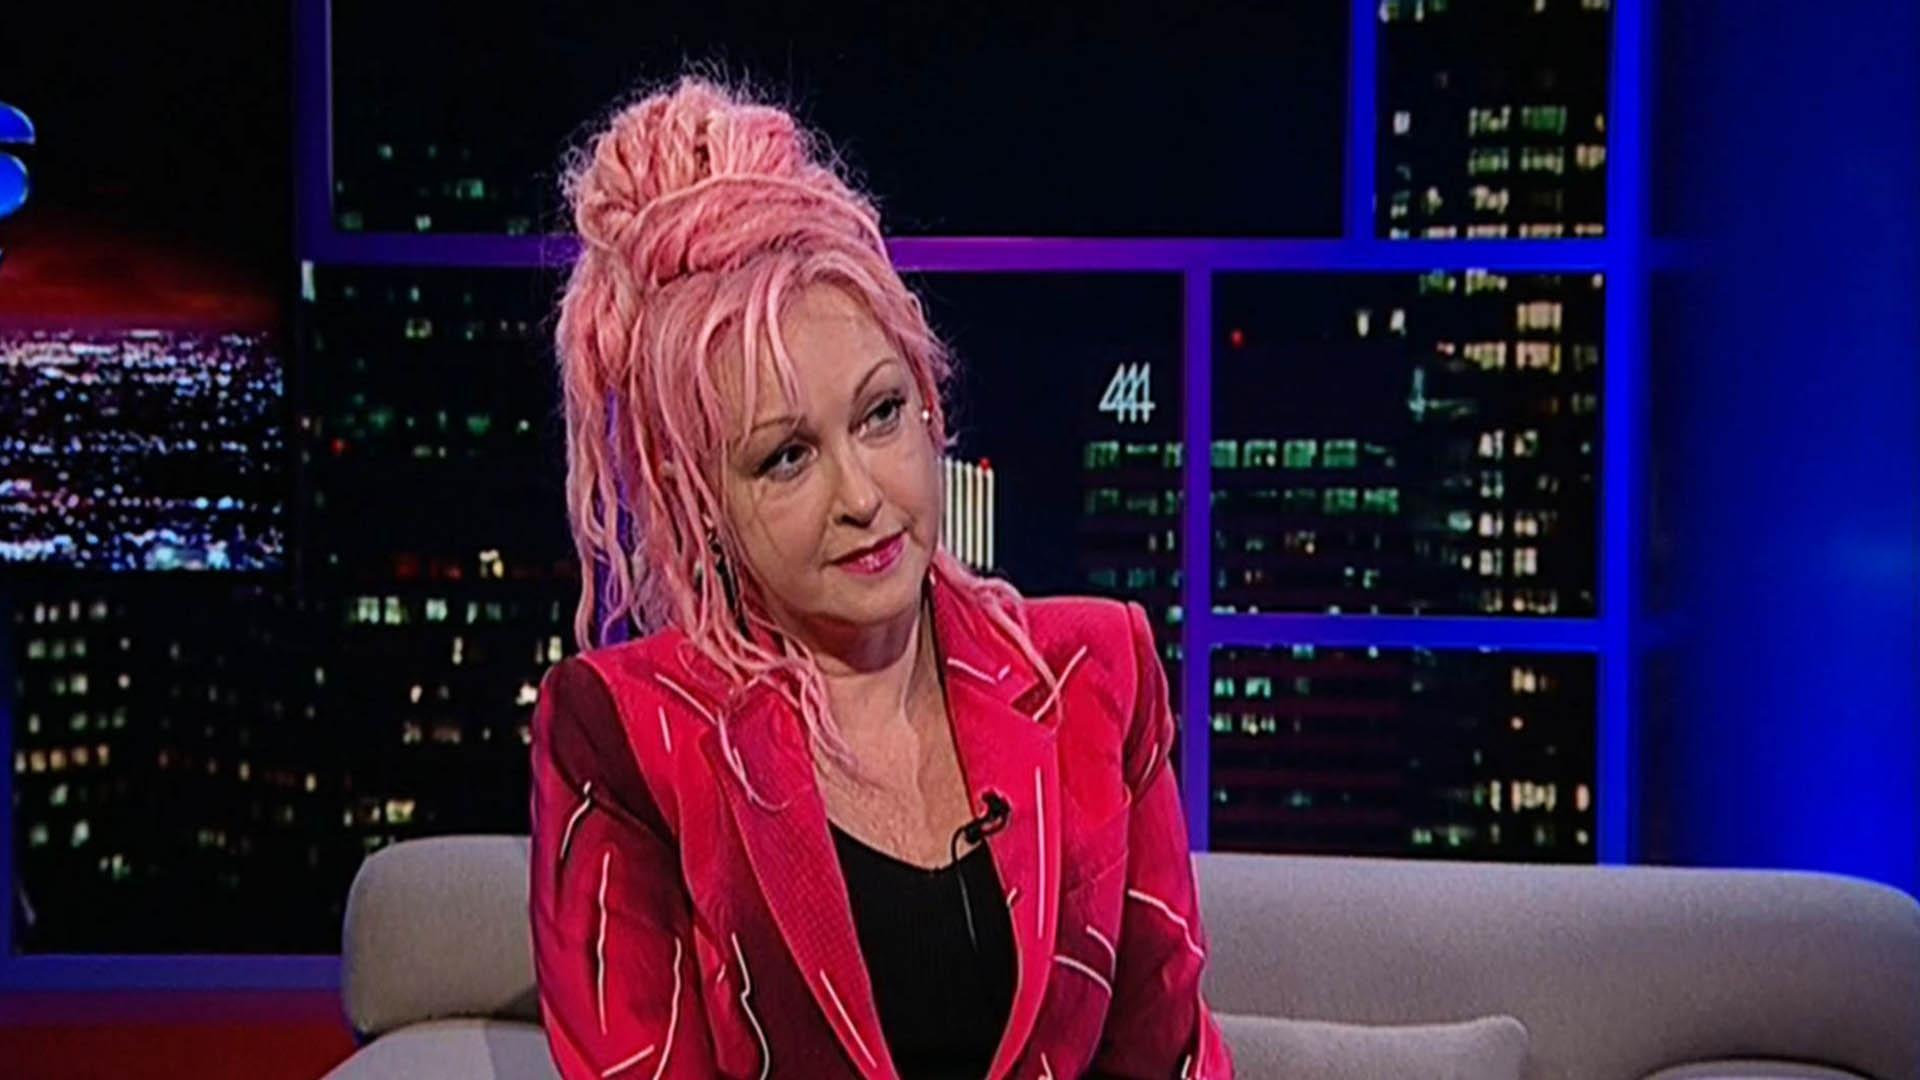 Singer-songwriter Cyndi Lauper, pt. 2